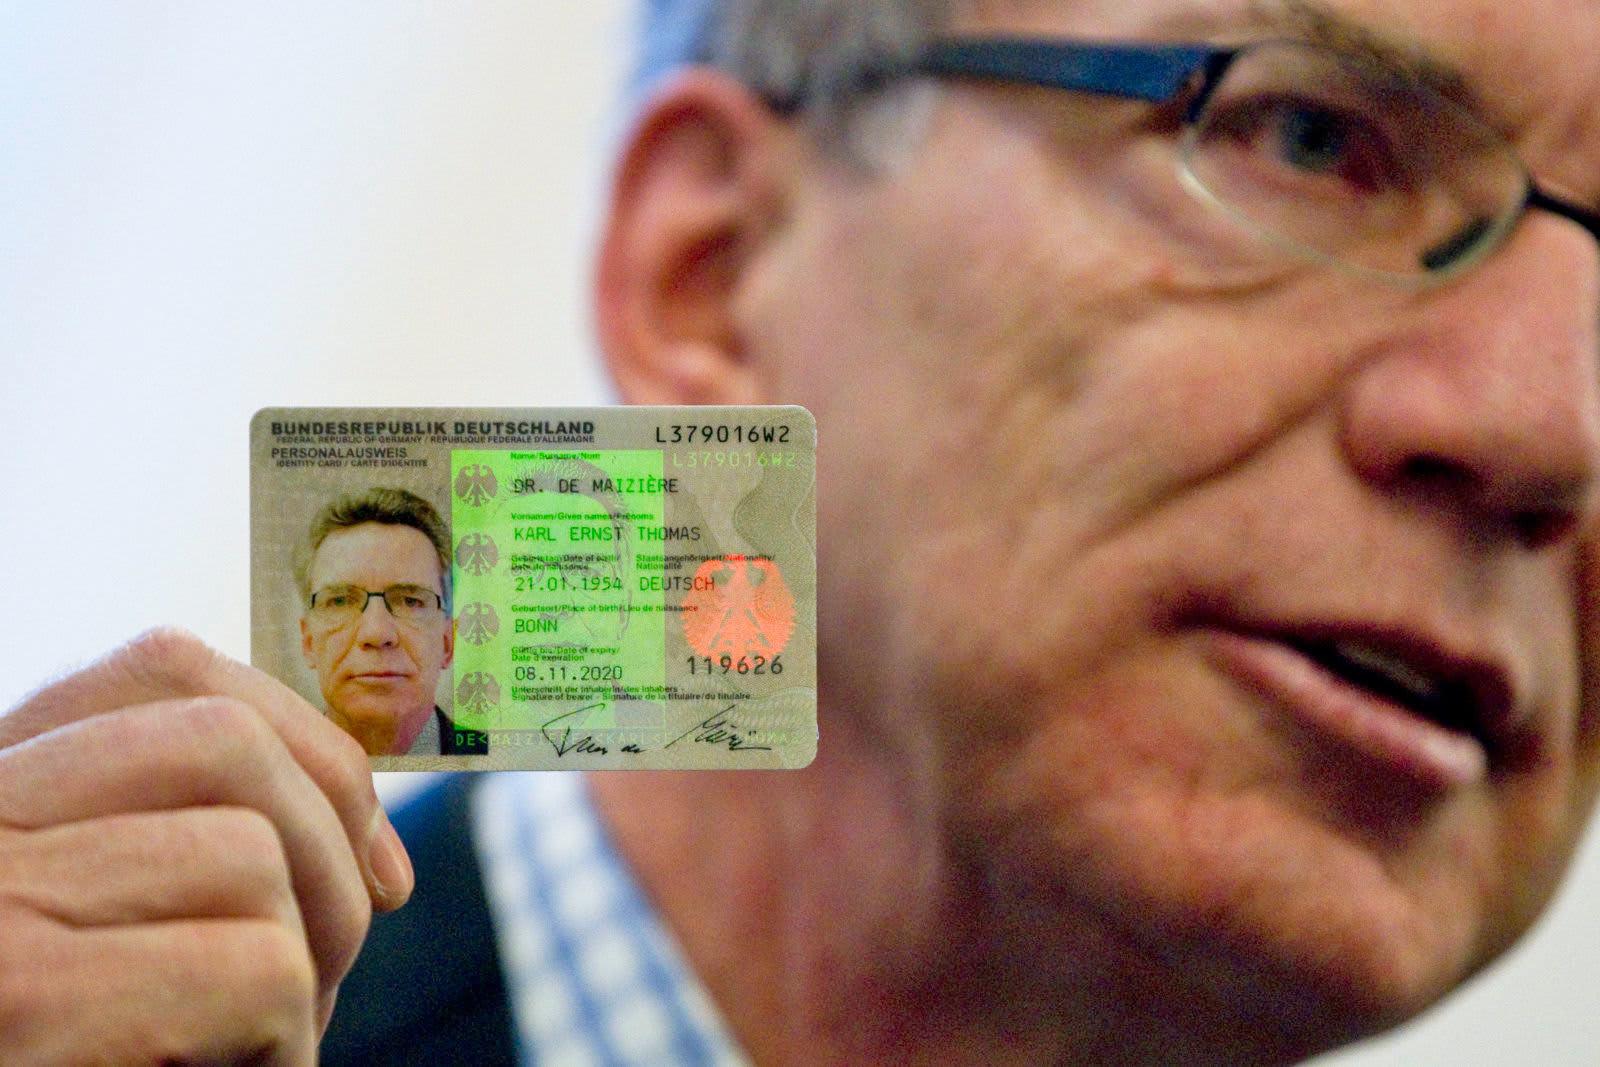 Germany ID Card